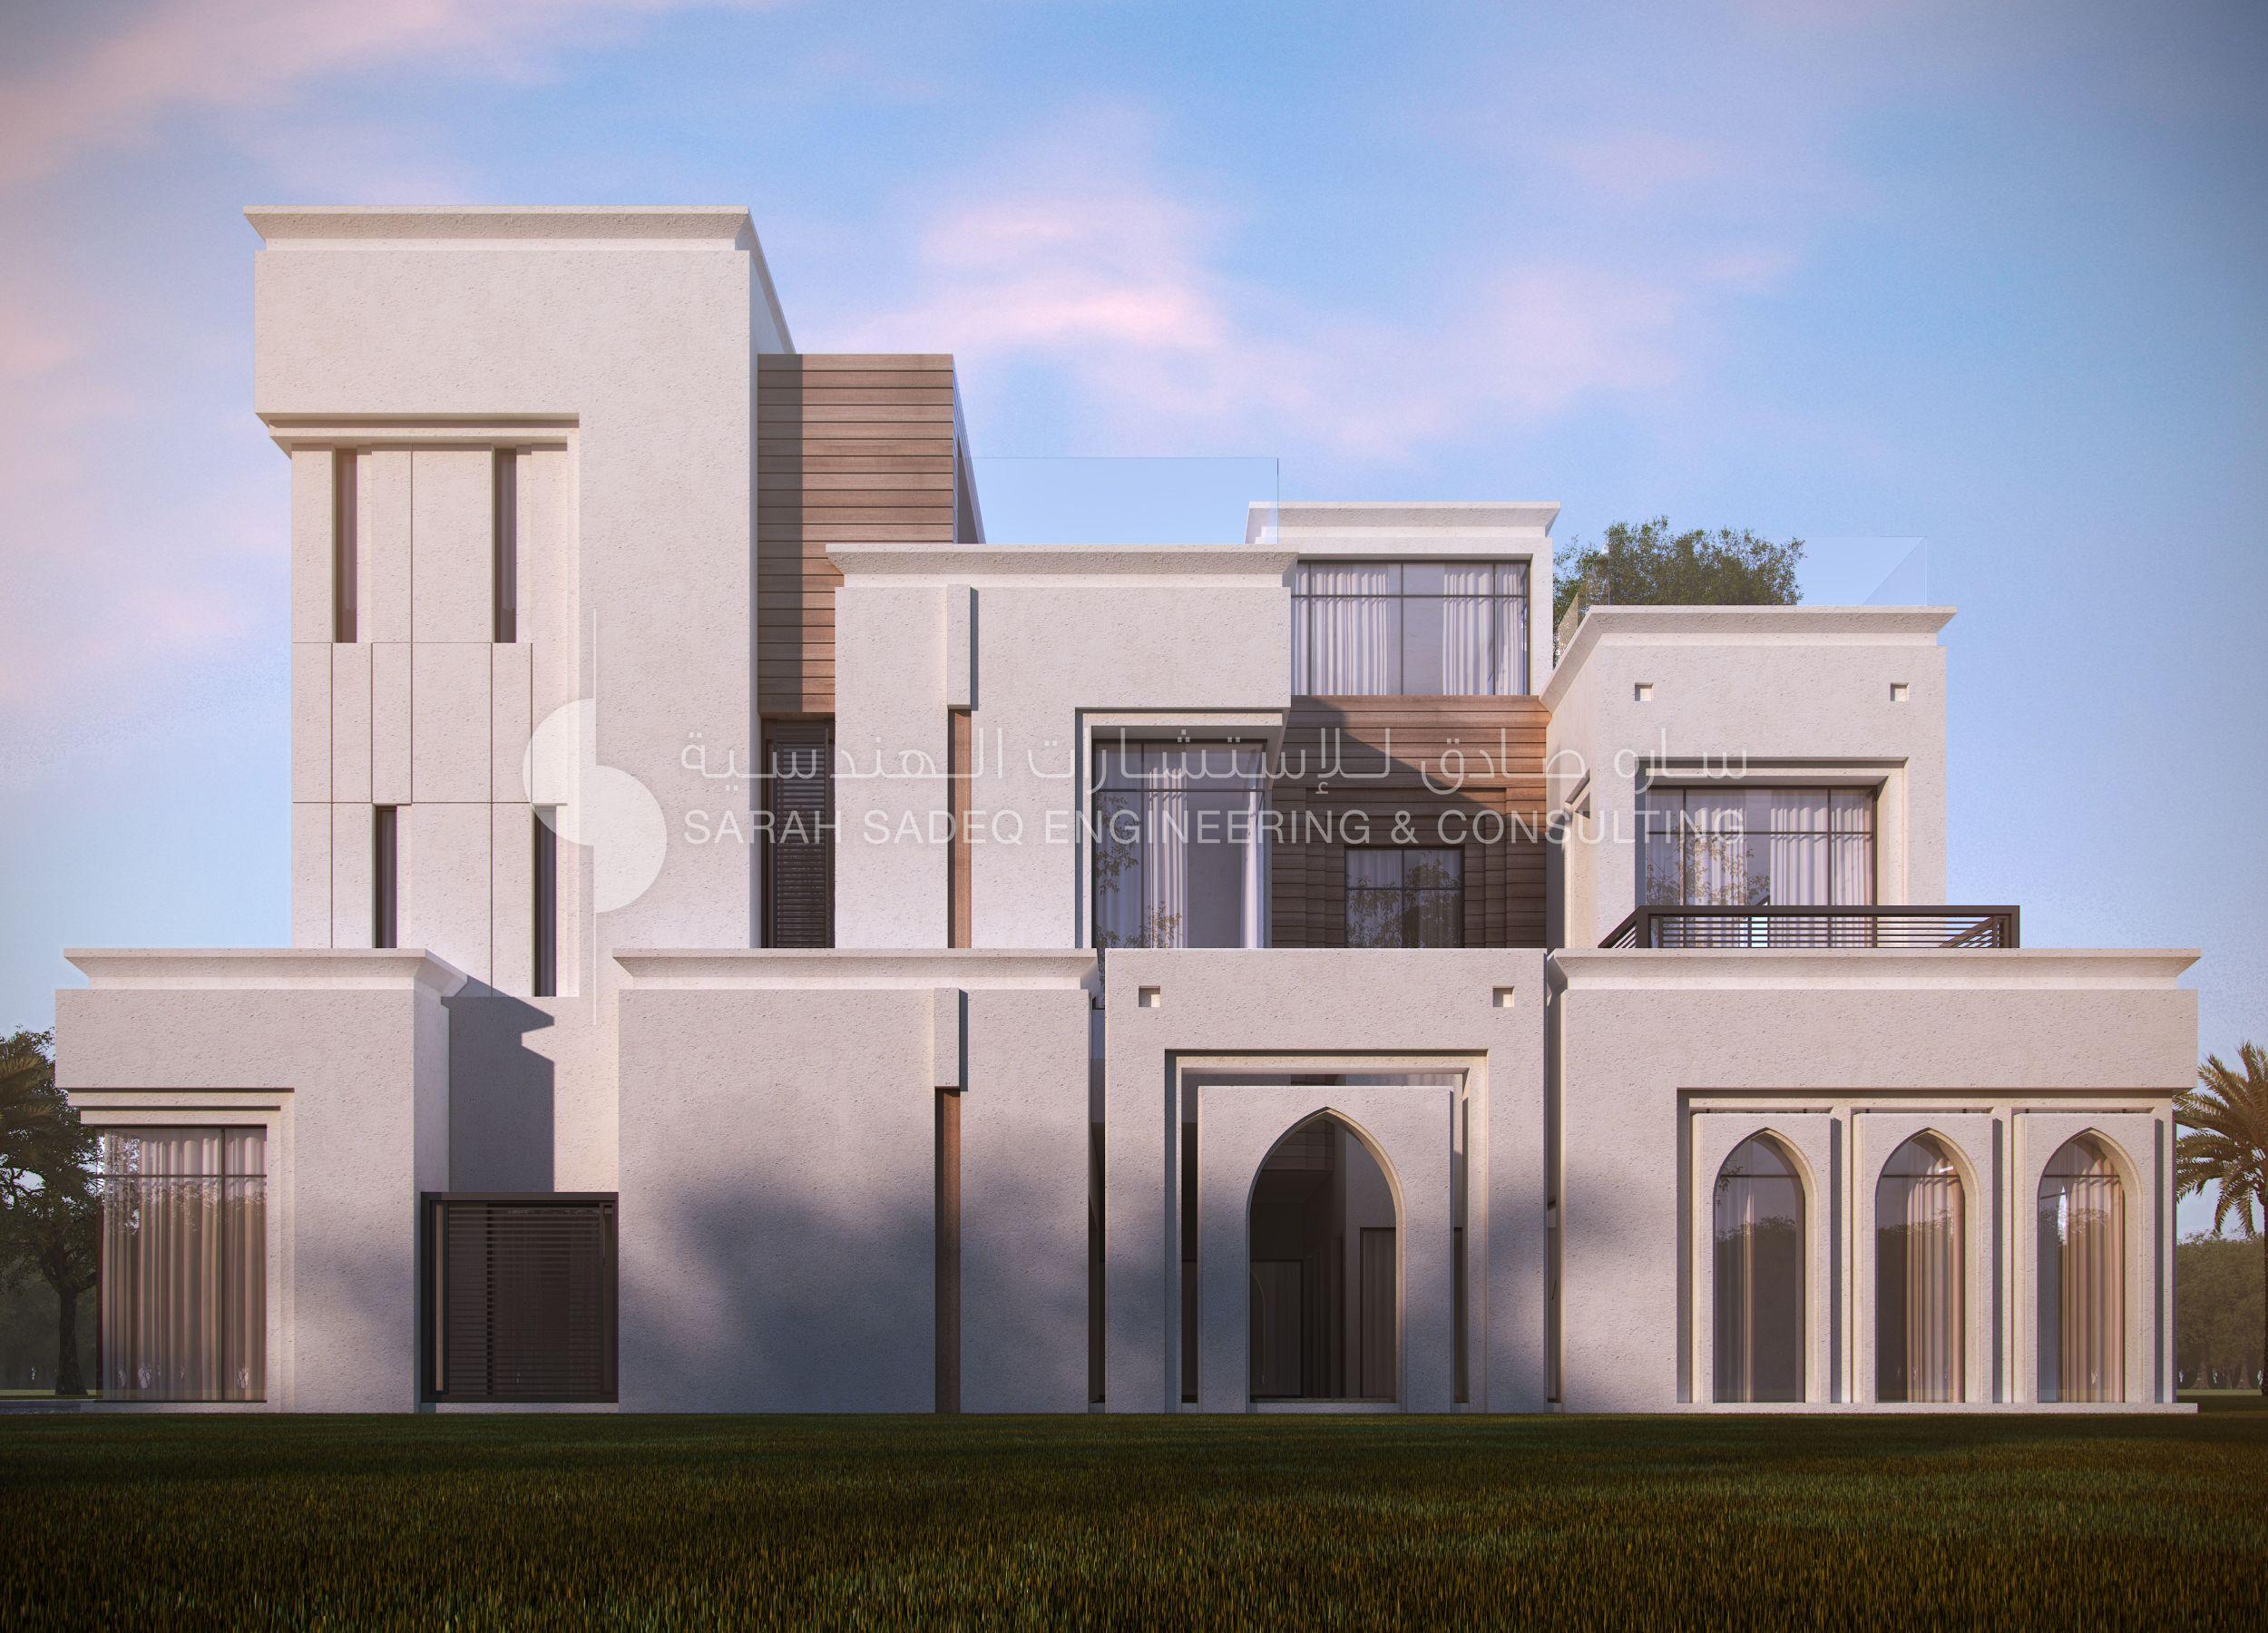 Private Villa Kuwait 500 M Sarah Sadeq Architects House Front Design House Architecture Design Bungalow Design